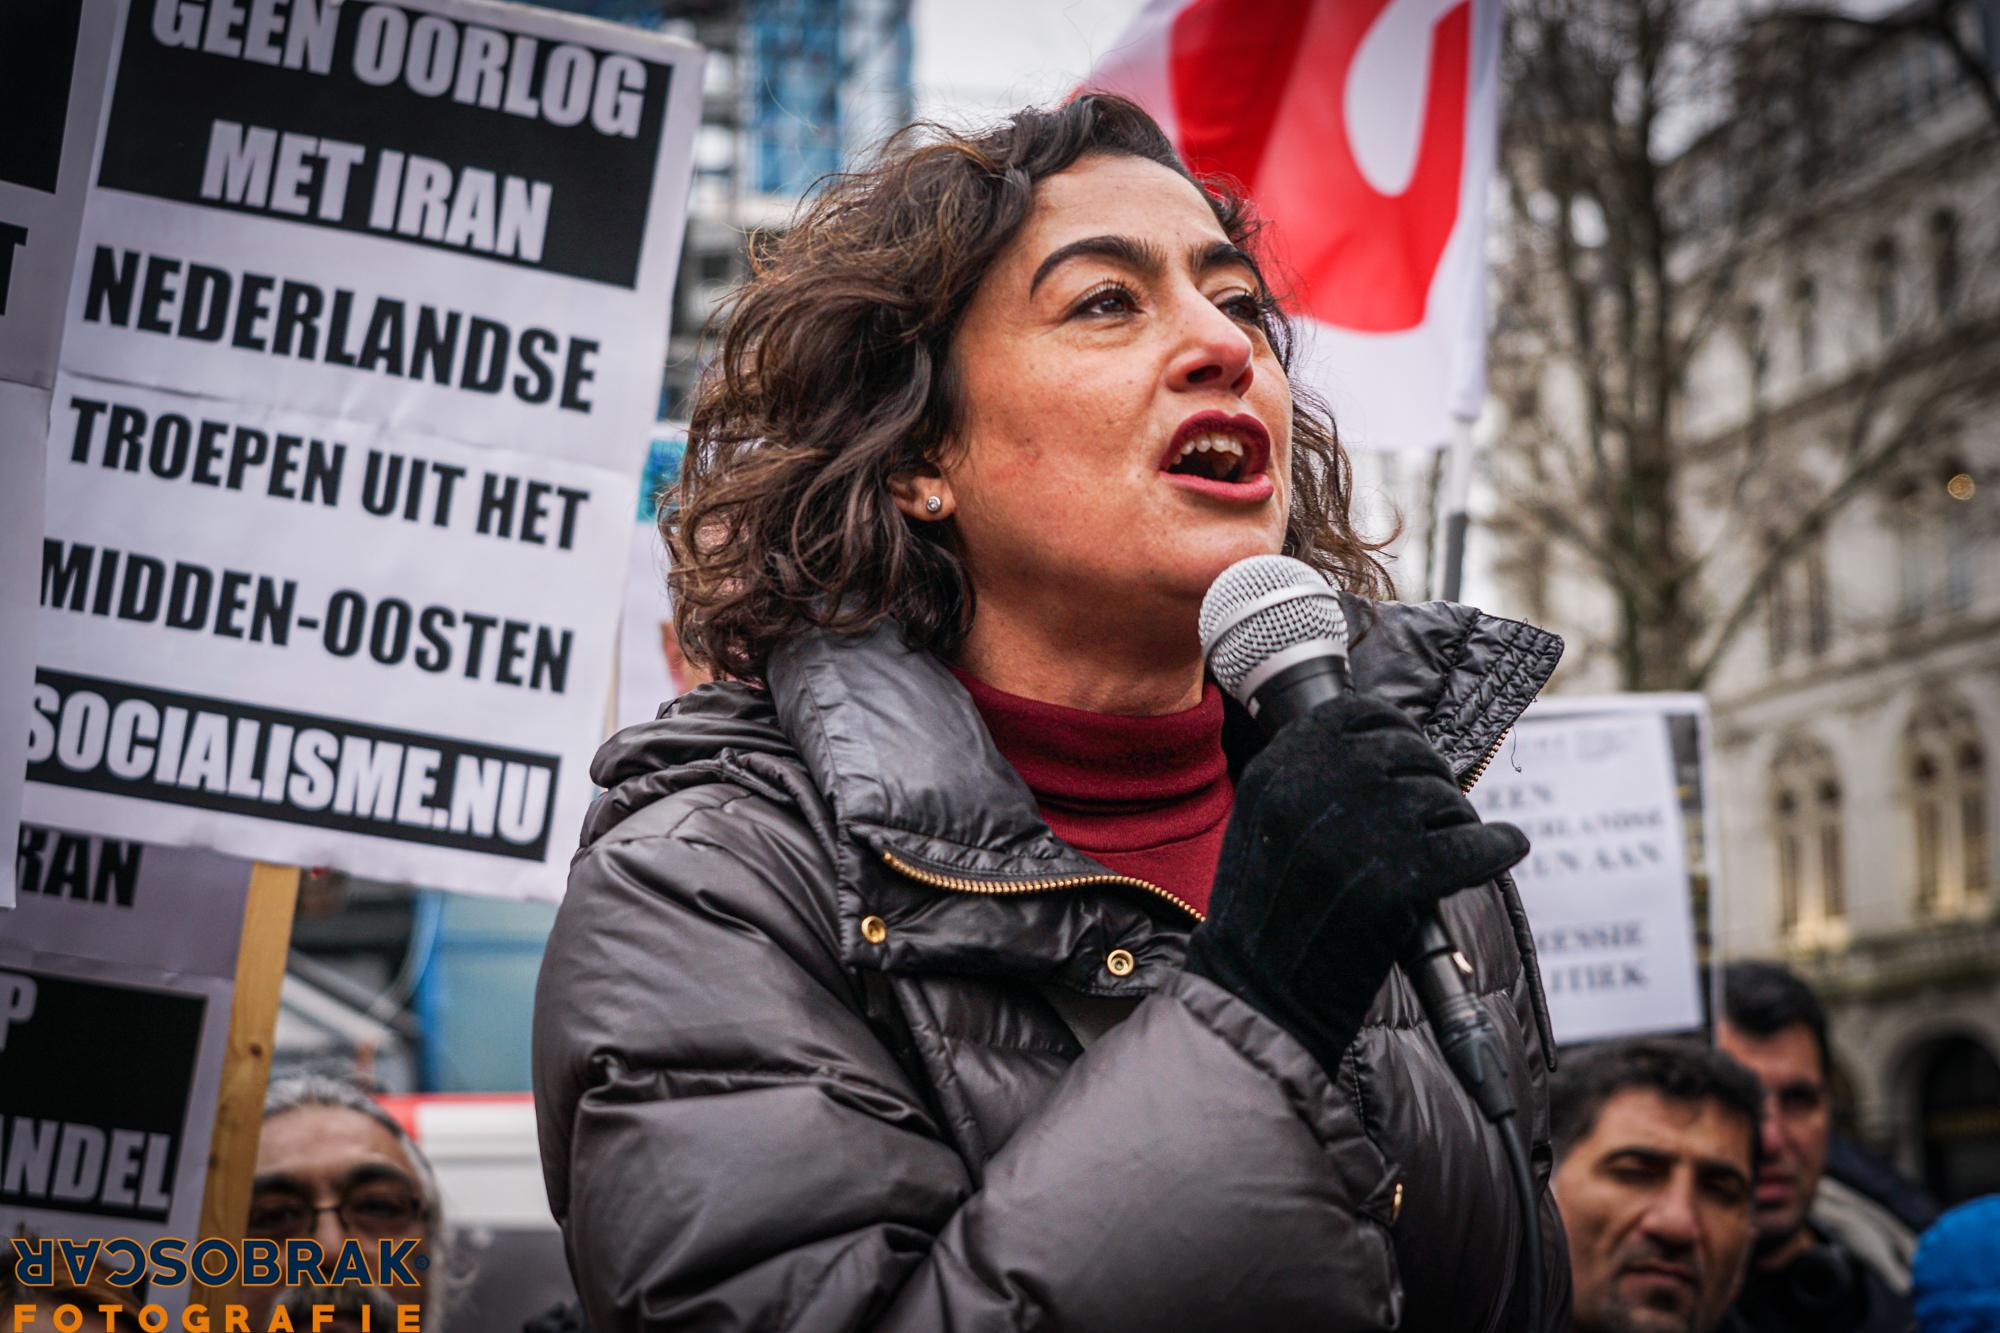 No war with Iran Amsterdam Spui Oscar Brak Fotografie